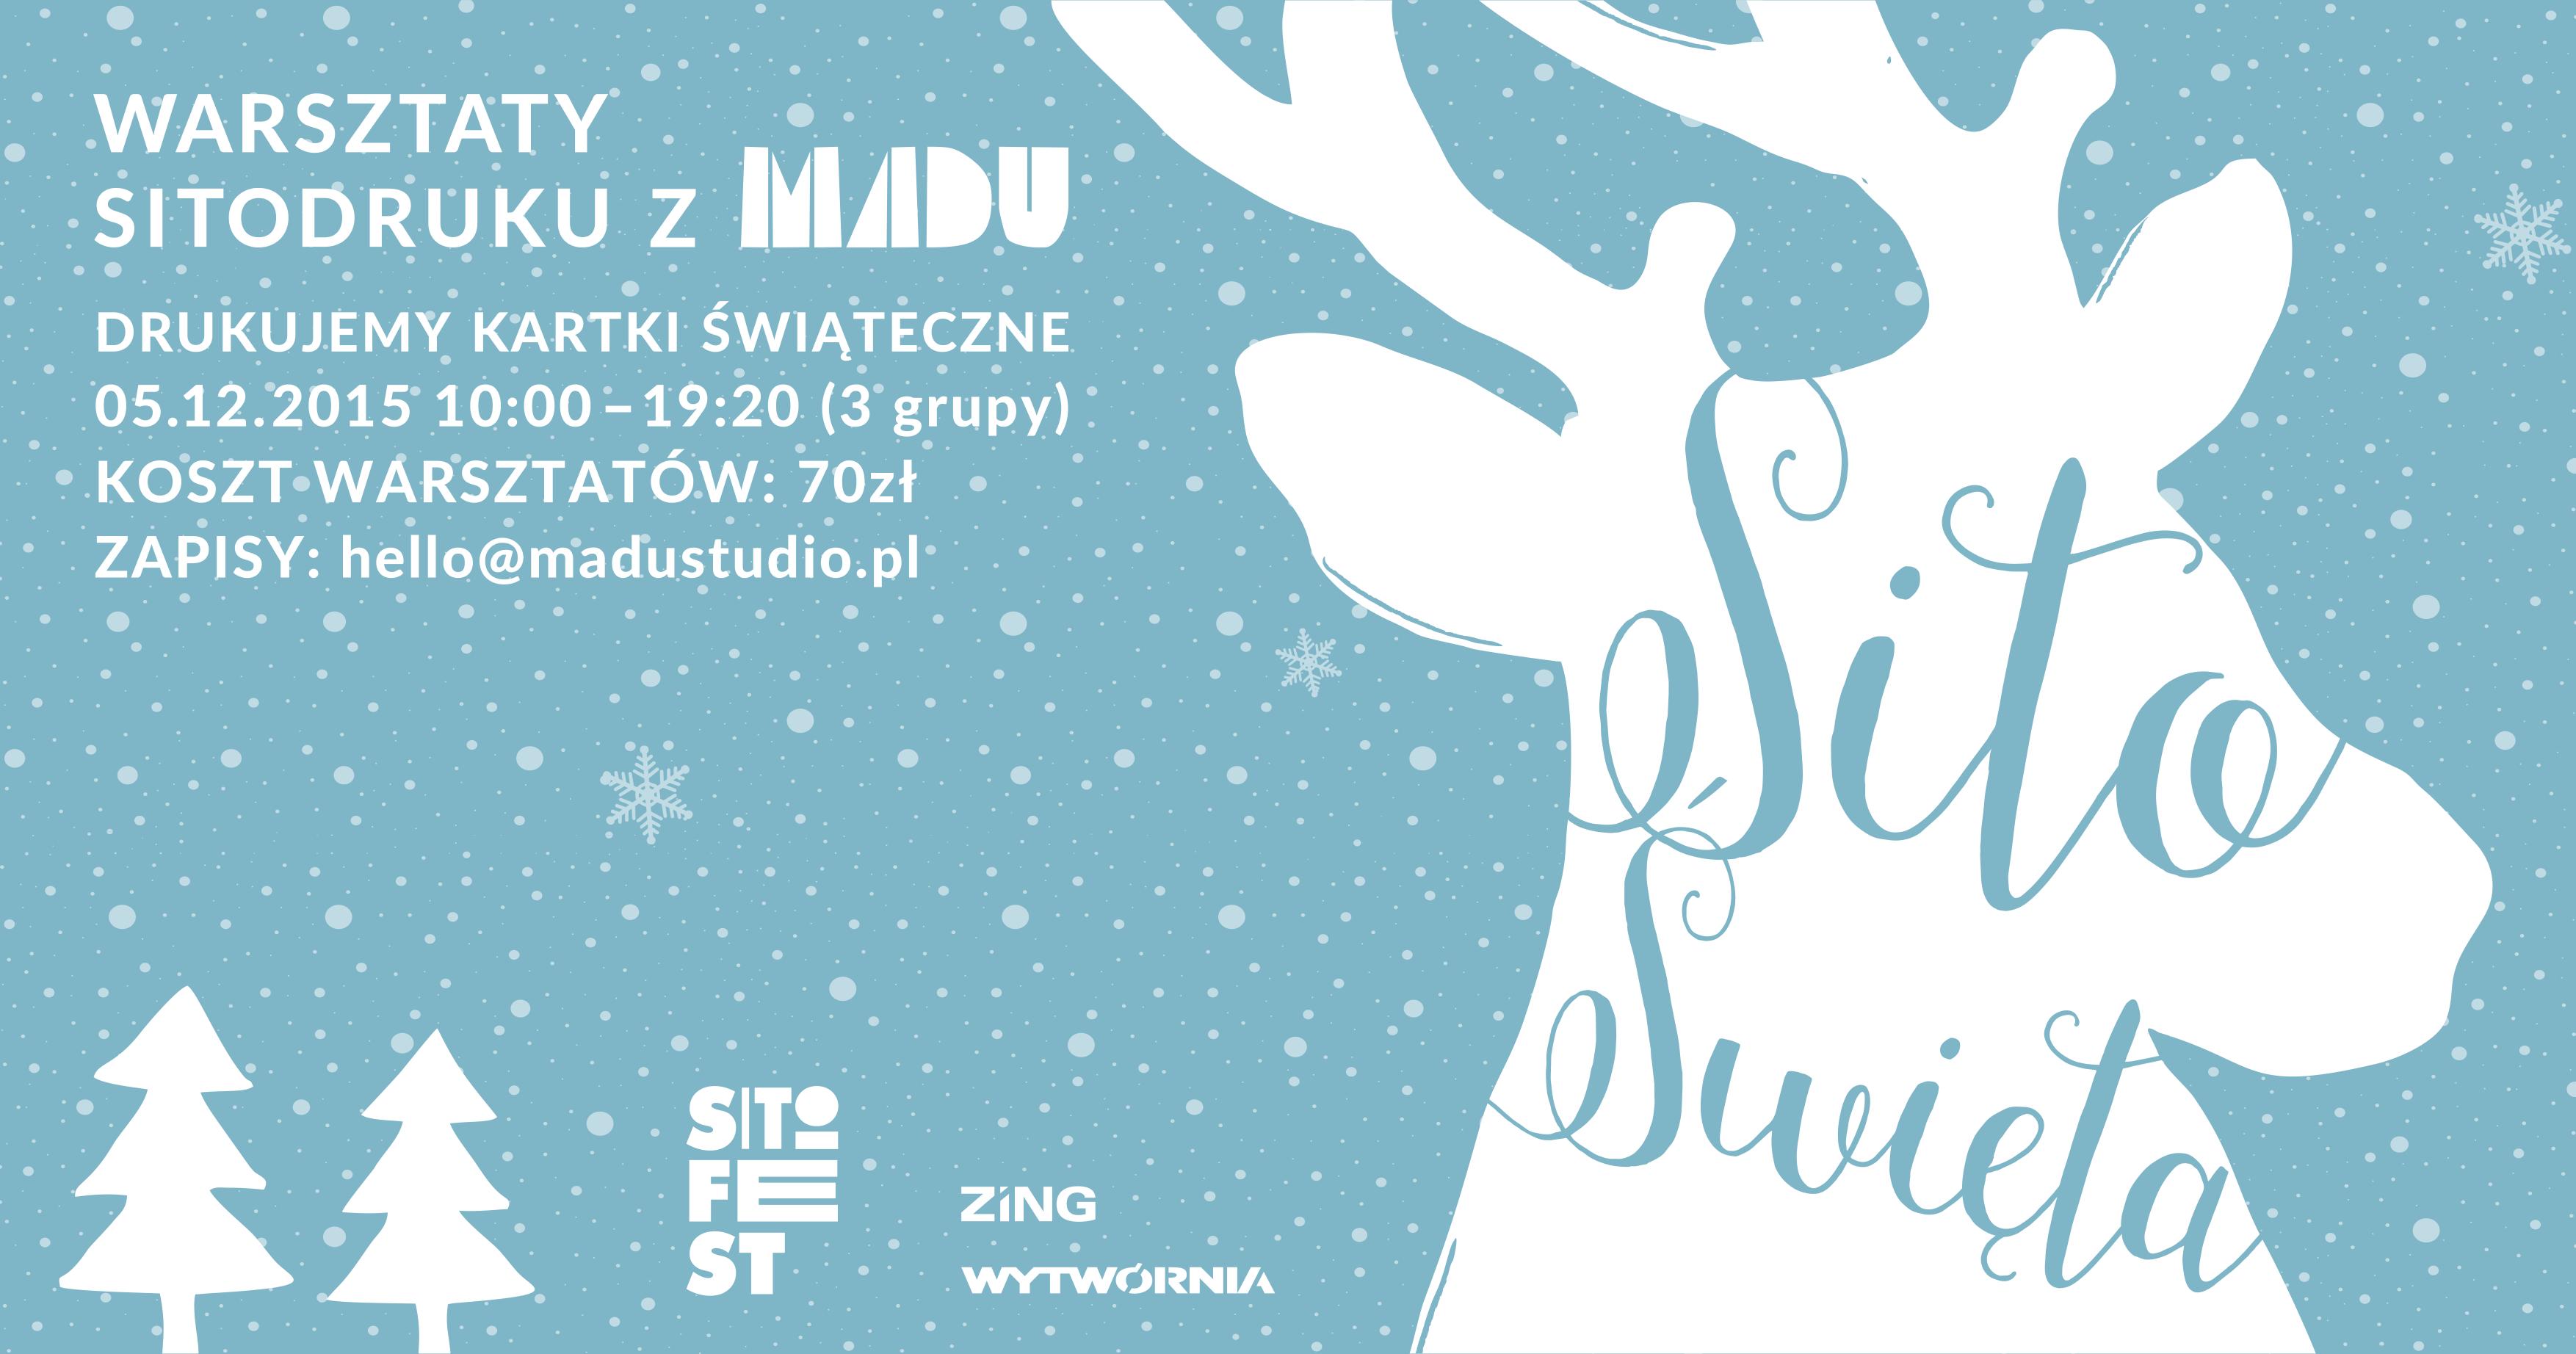 SITOFEST_MADU_reklama_OK